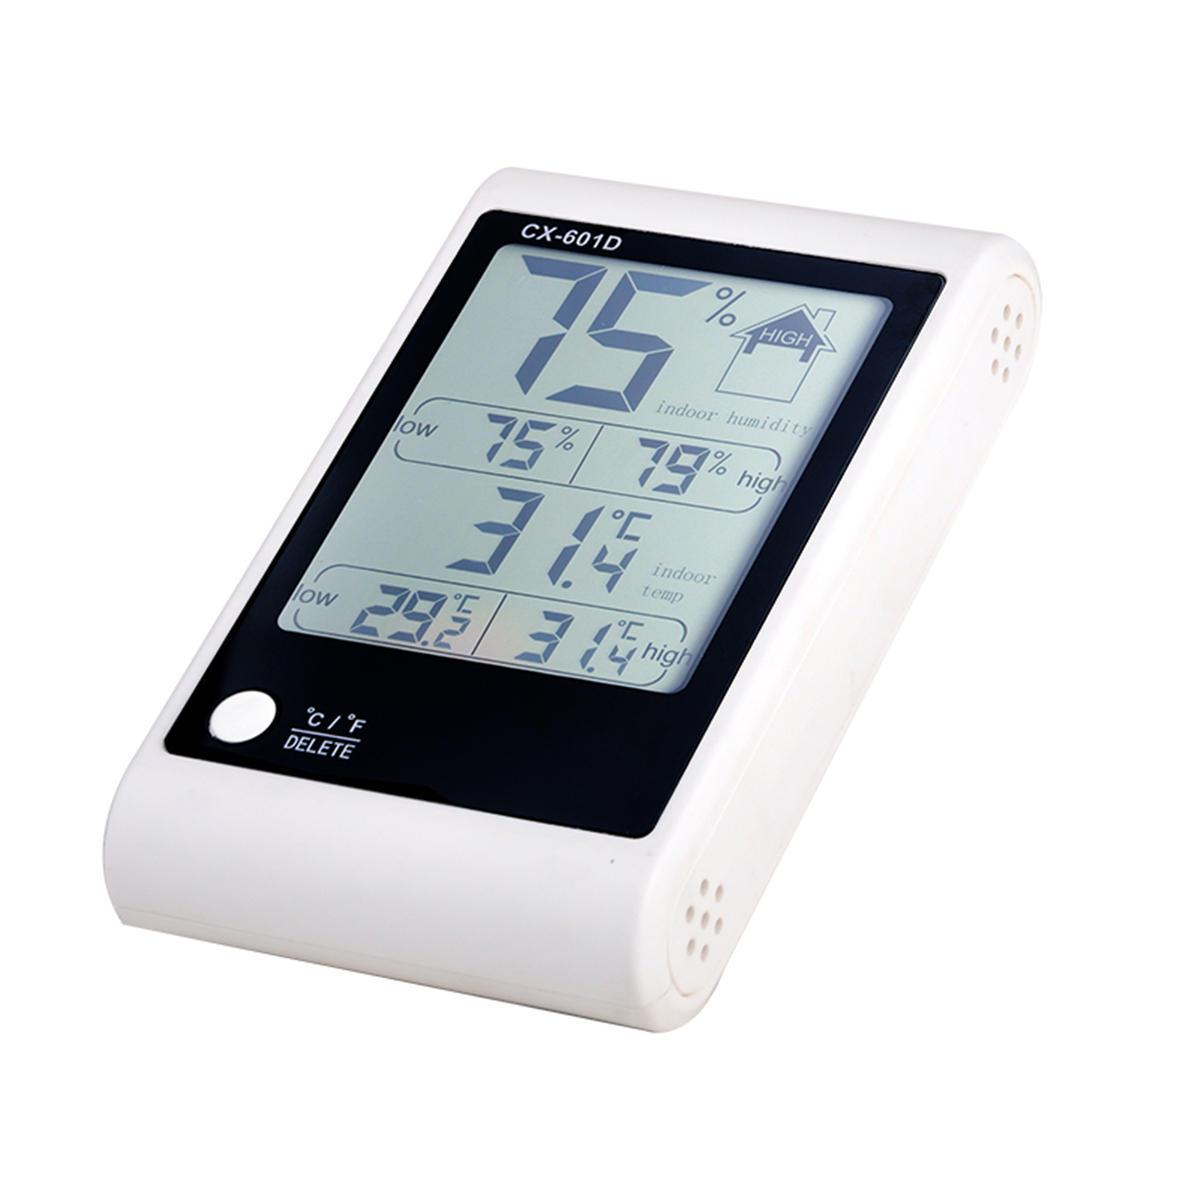 ThermoPro TP50 Digital LCD Indoor Thermometer Hygrometer Meter Suhu Kelembaban